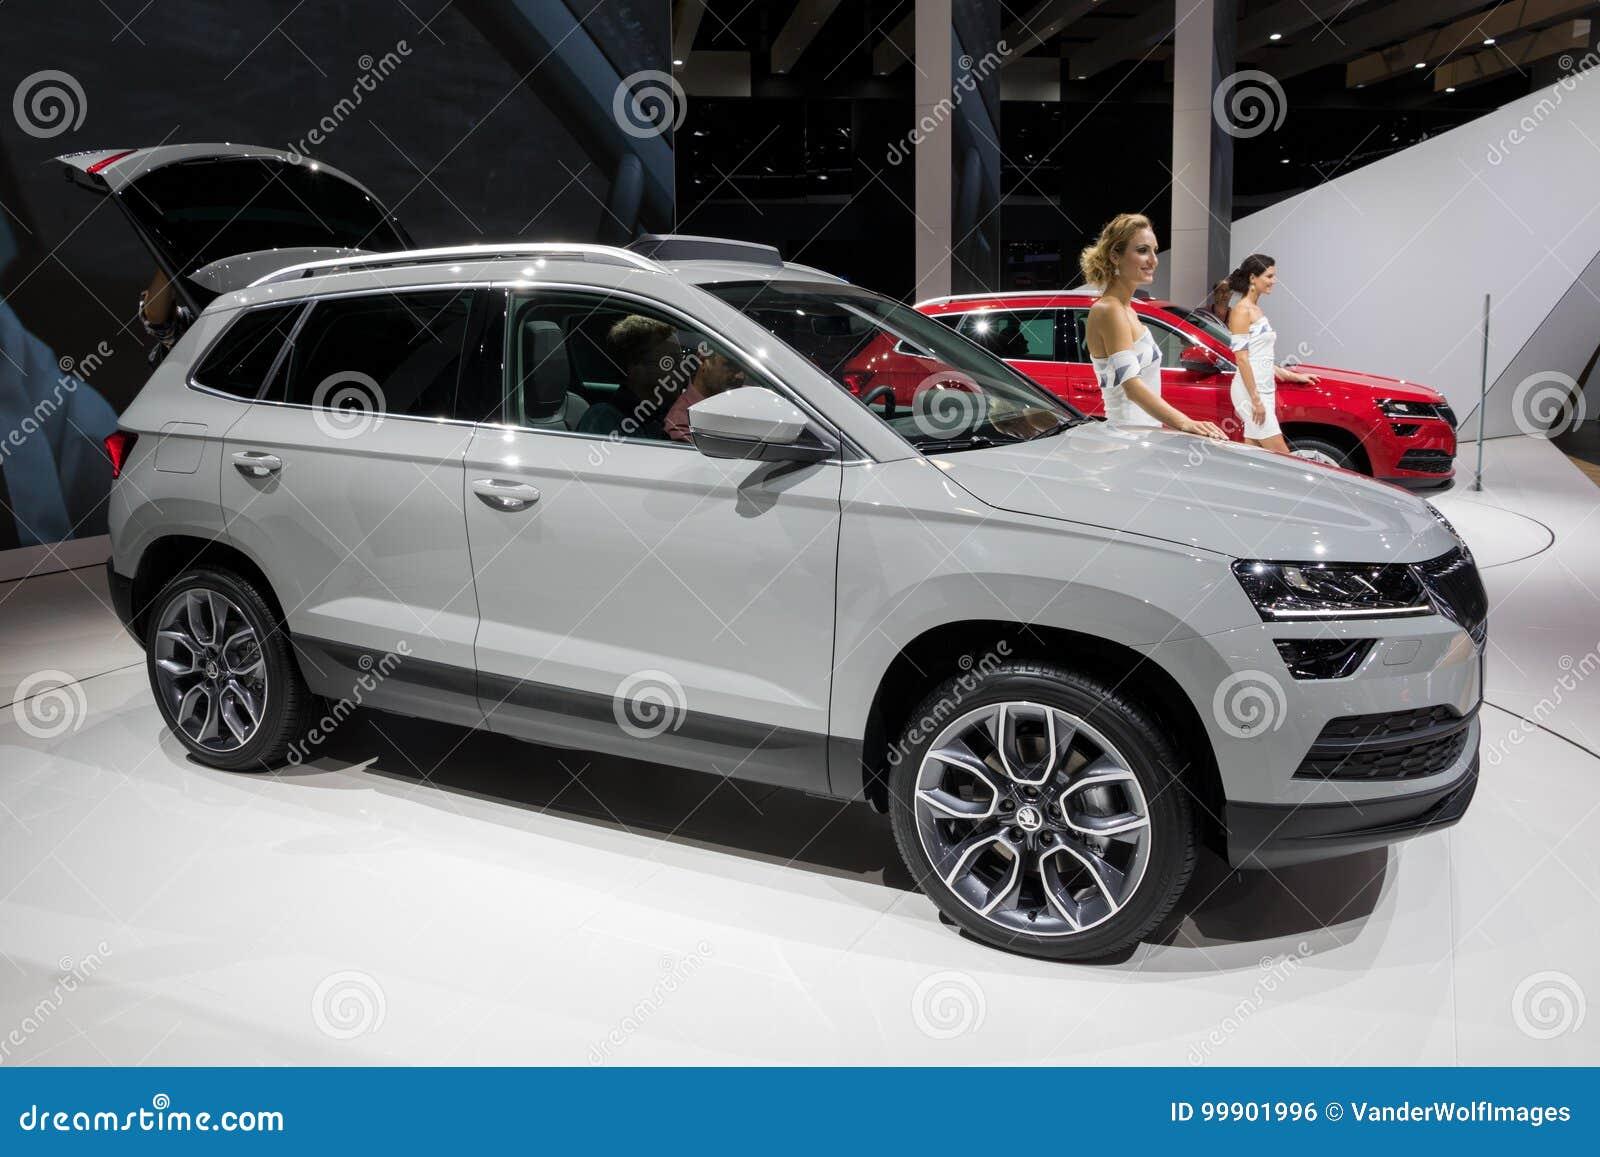 skoda karoq rs skoda in 2018 t cars sport cars and. Black Bedroom Furniture Sets. Home Design Ideas